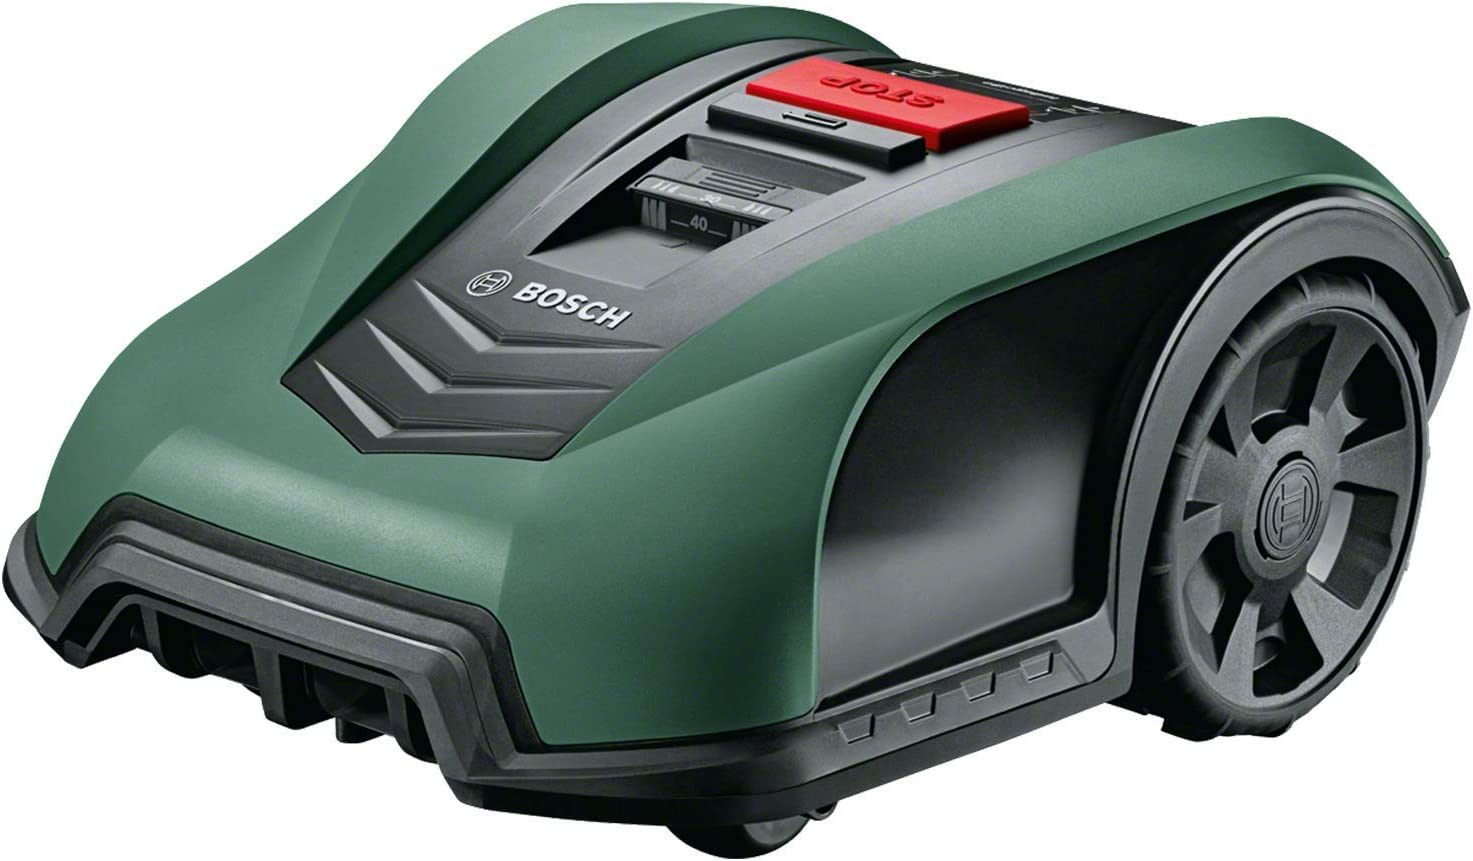 Bosch Robotic Lawnmower Indego